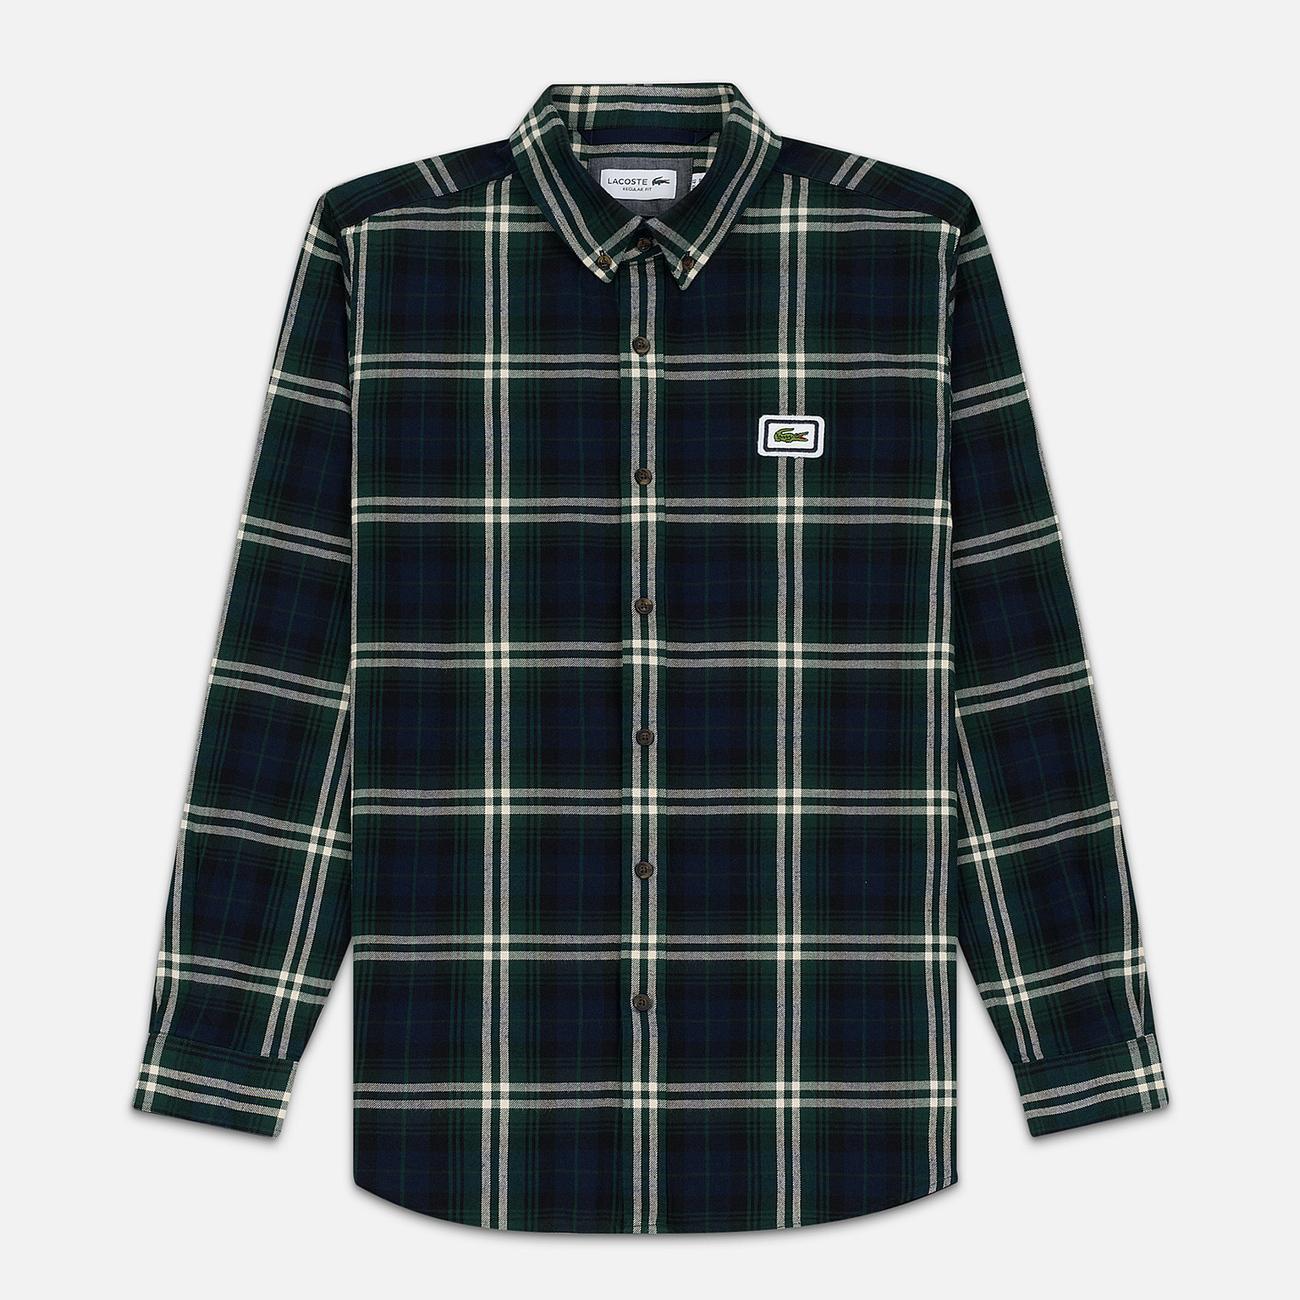 Мужская рубашка Lacoste Regular Fit Check Flannel Green/Beige